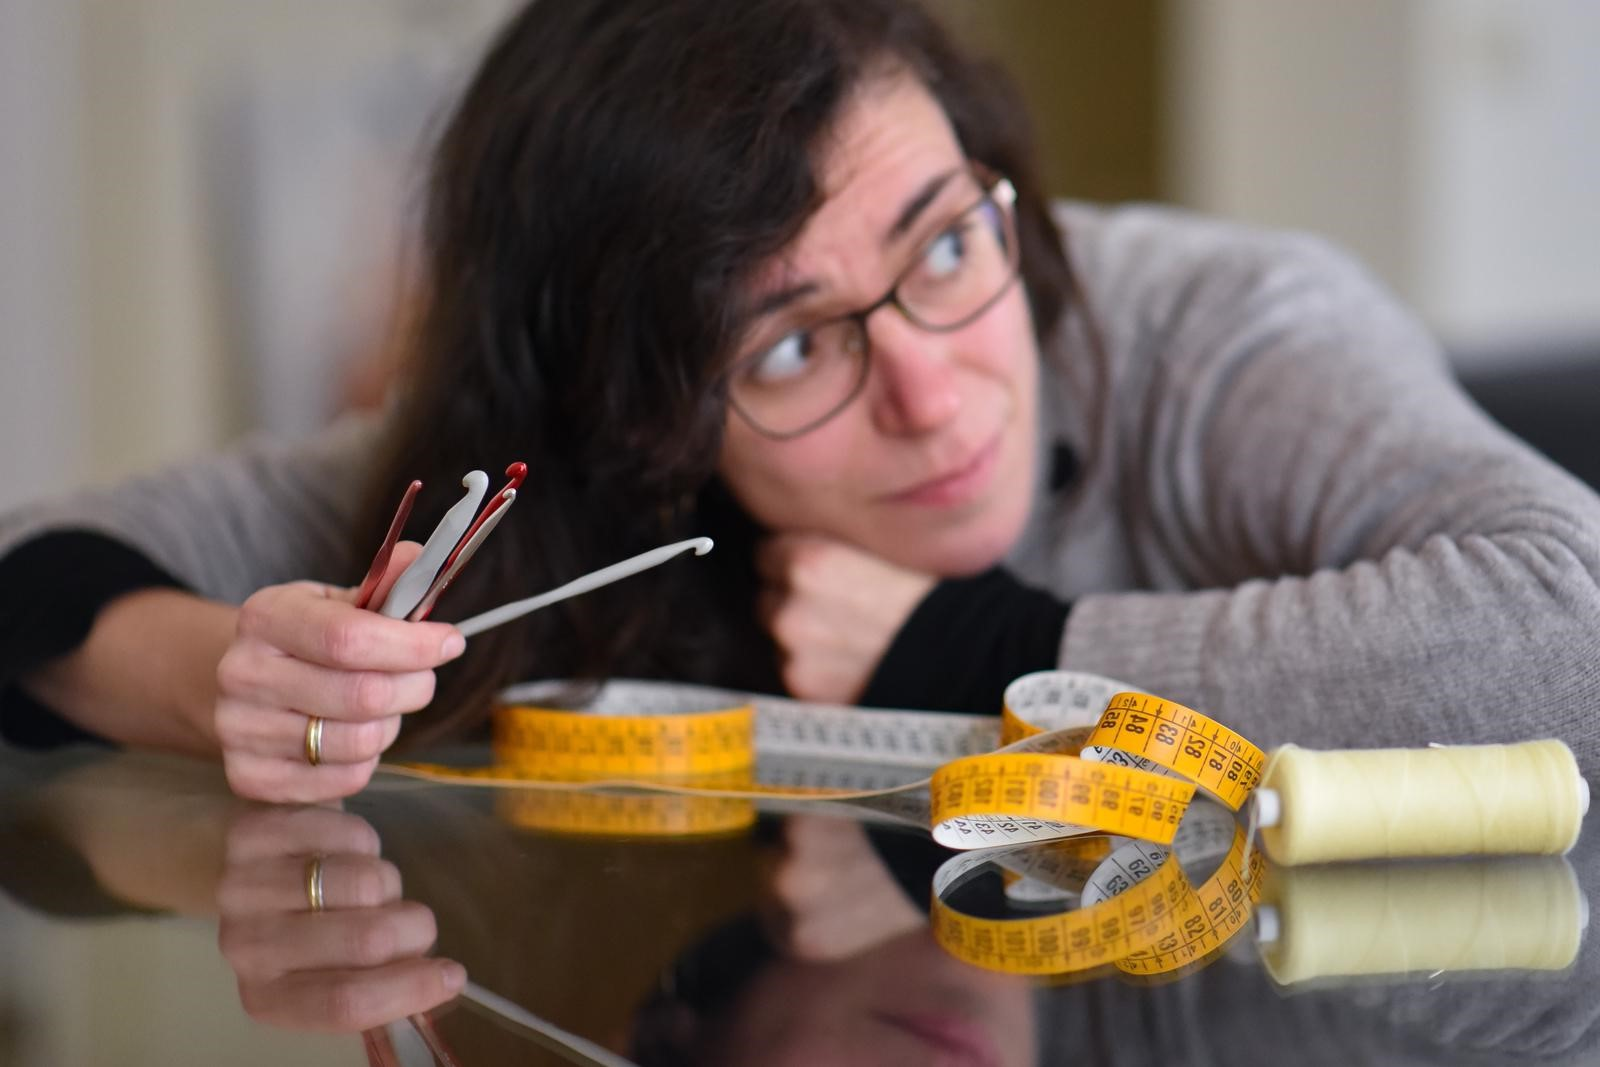 Antonella Viggiani